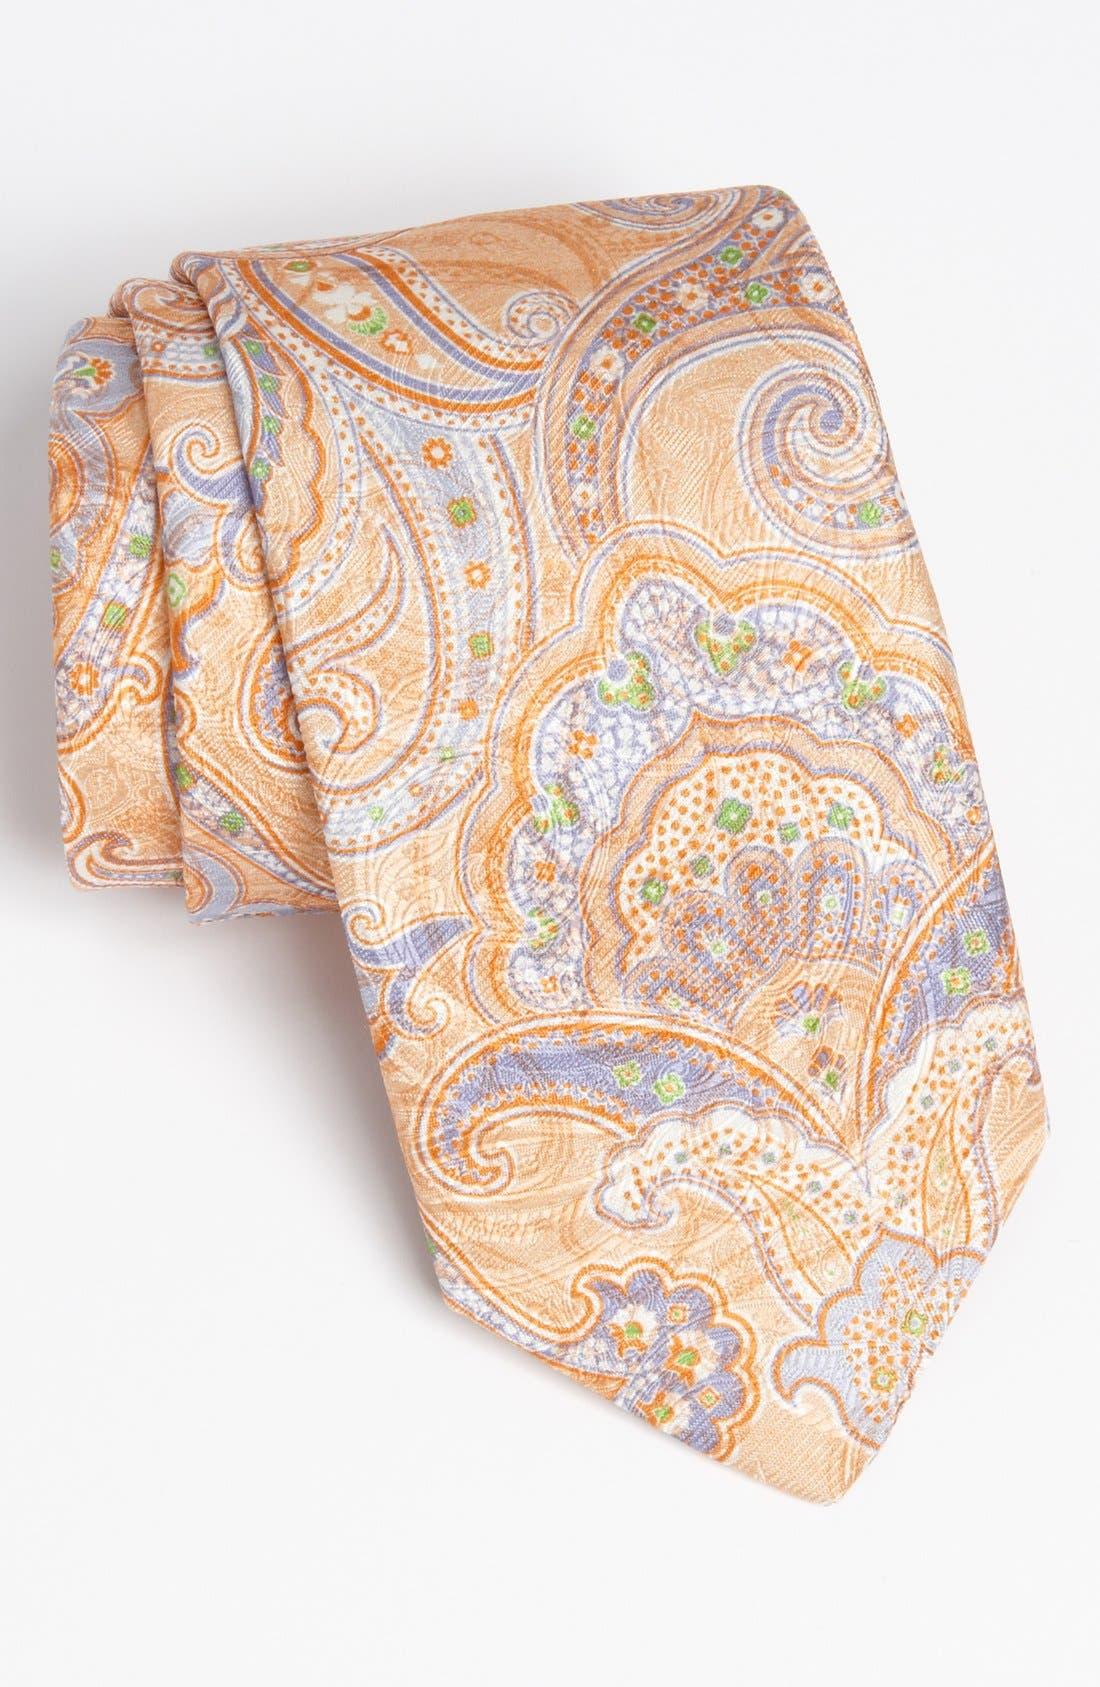 Alternate Image 1 Selected - Robert Talbott Woven Silk Tie